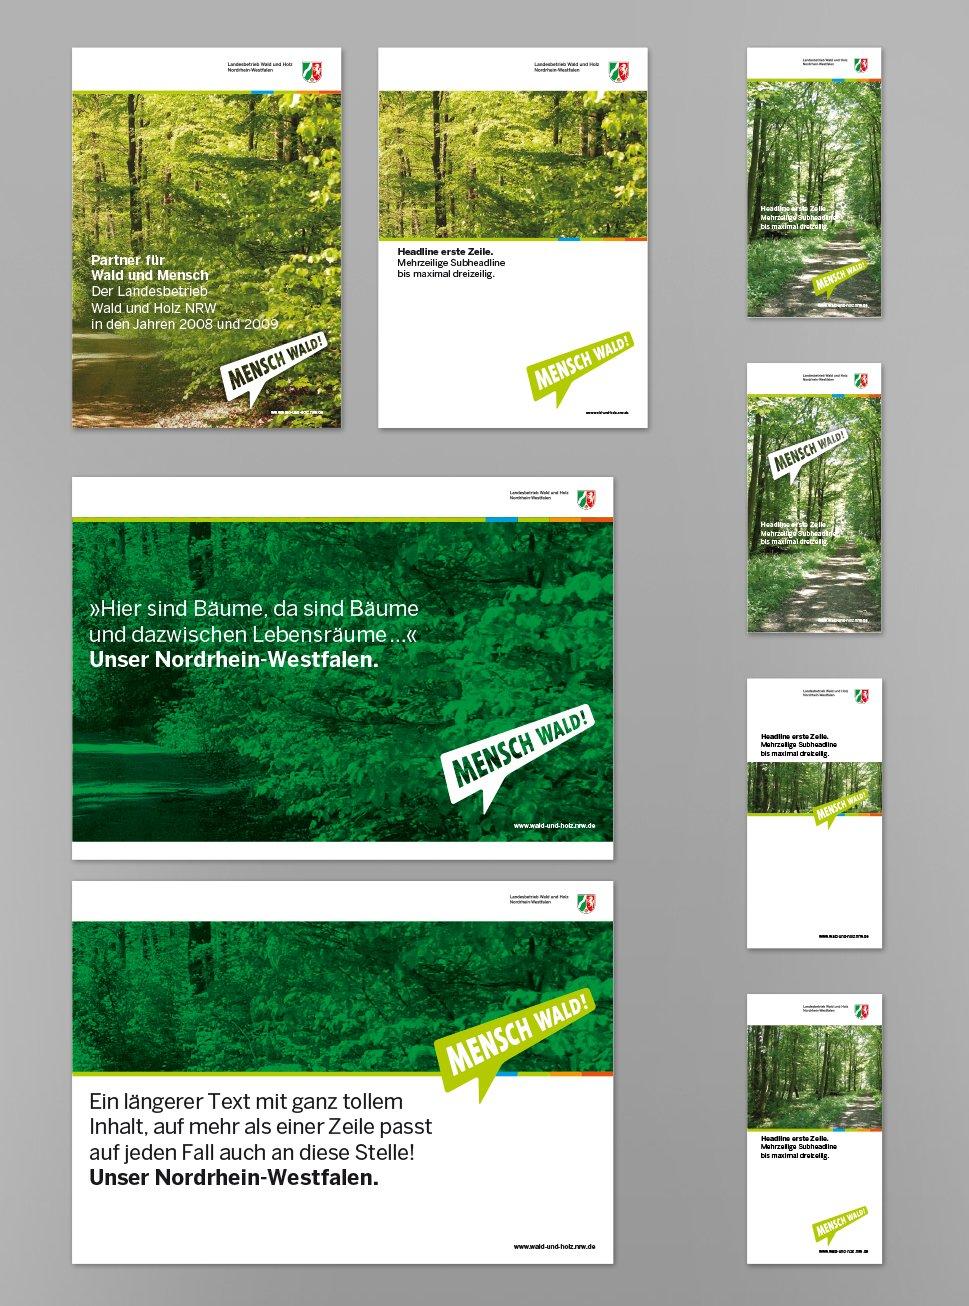 2 ForstNRW Mensch Wald Printkonzeption Flyer Cover 1